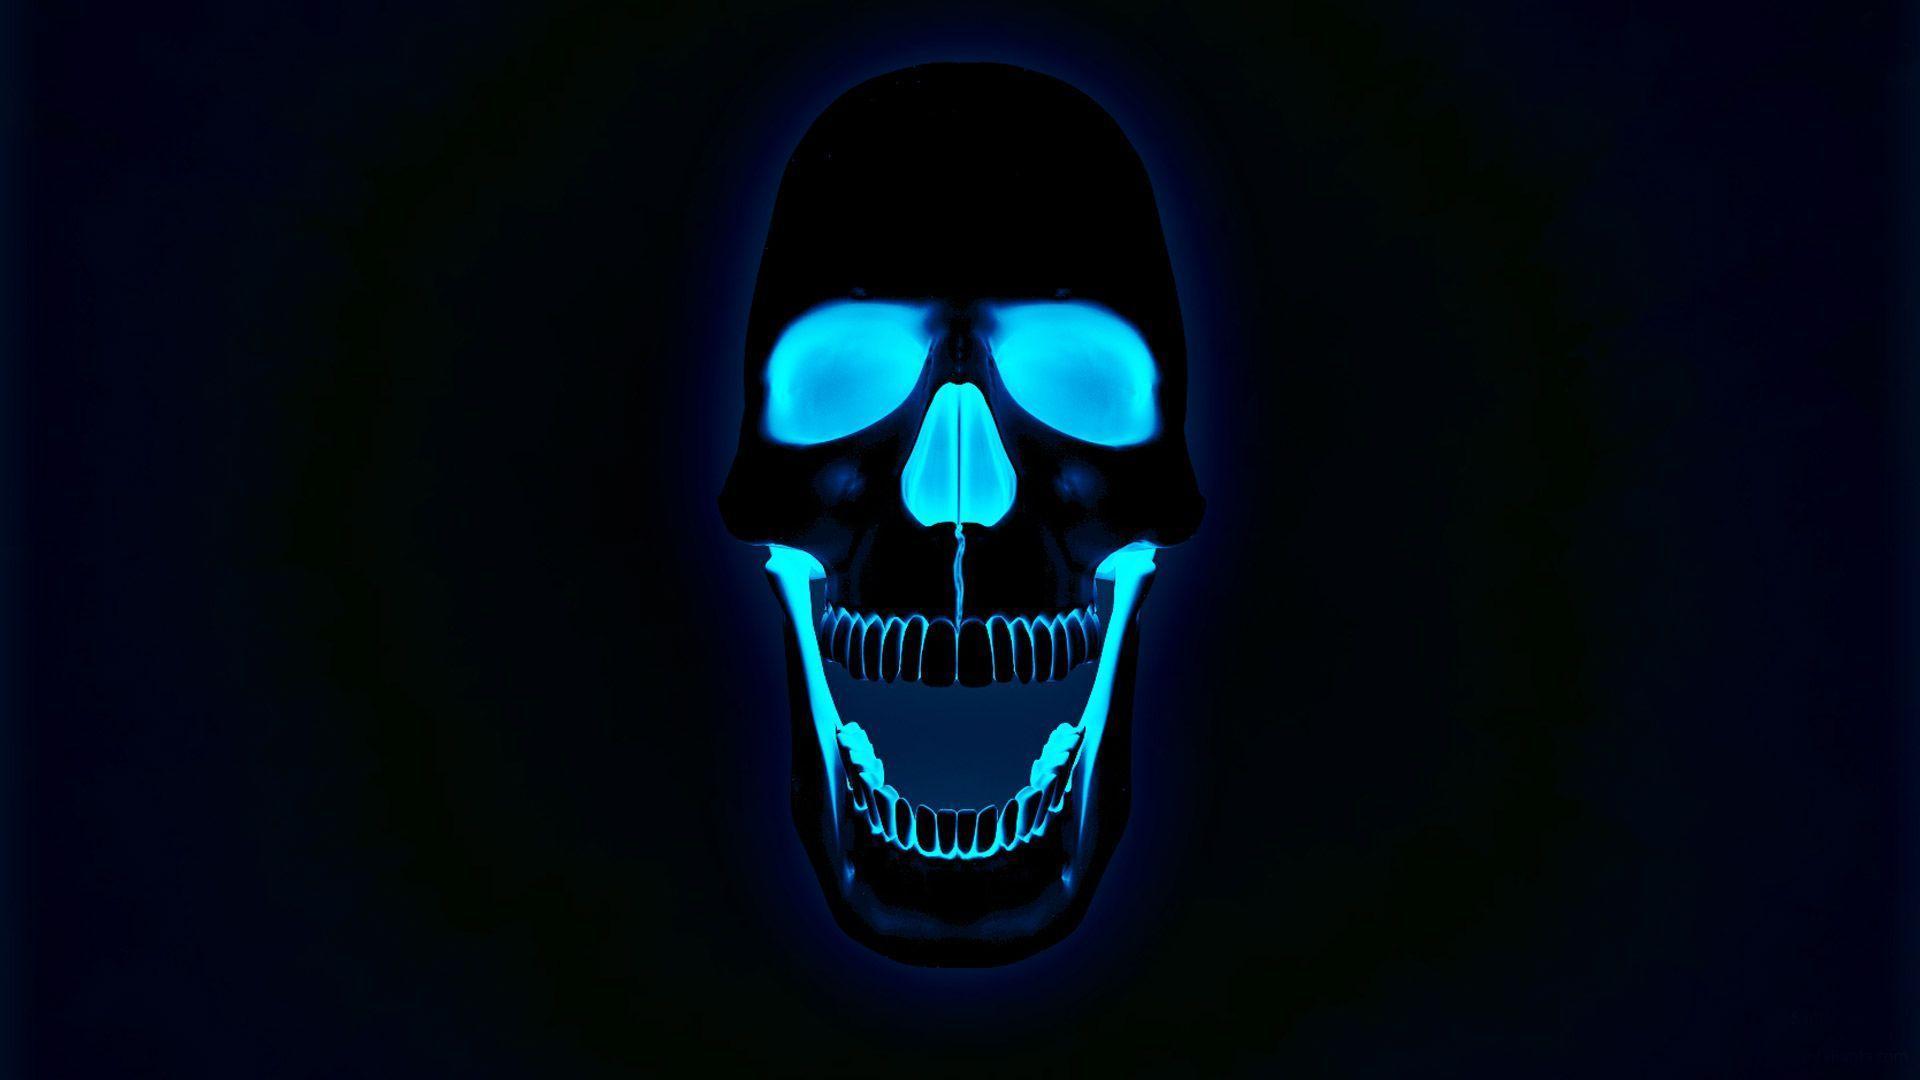 zombie skull wallpapers for desktop - photo #41